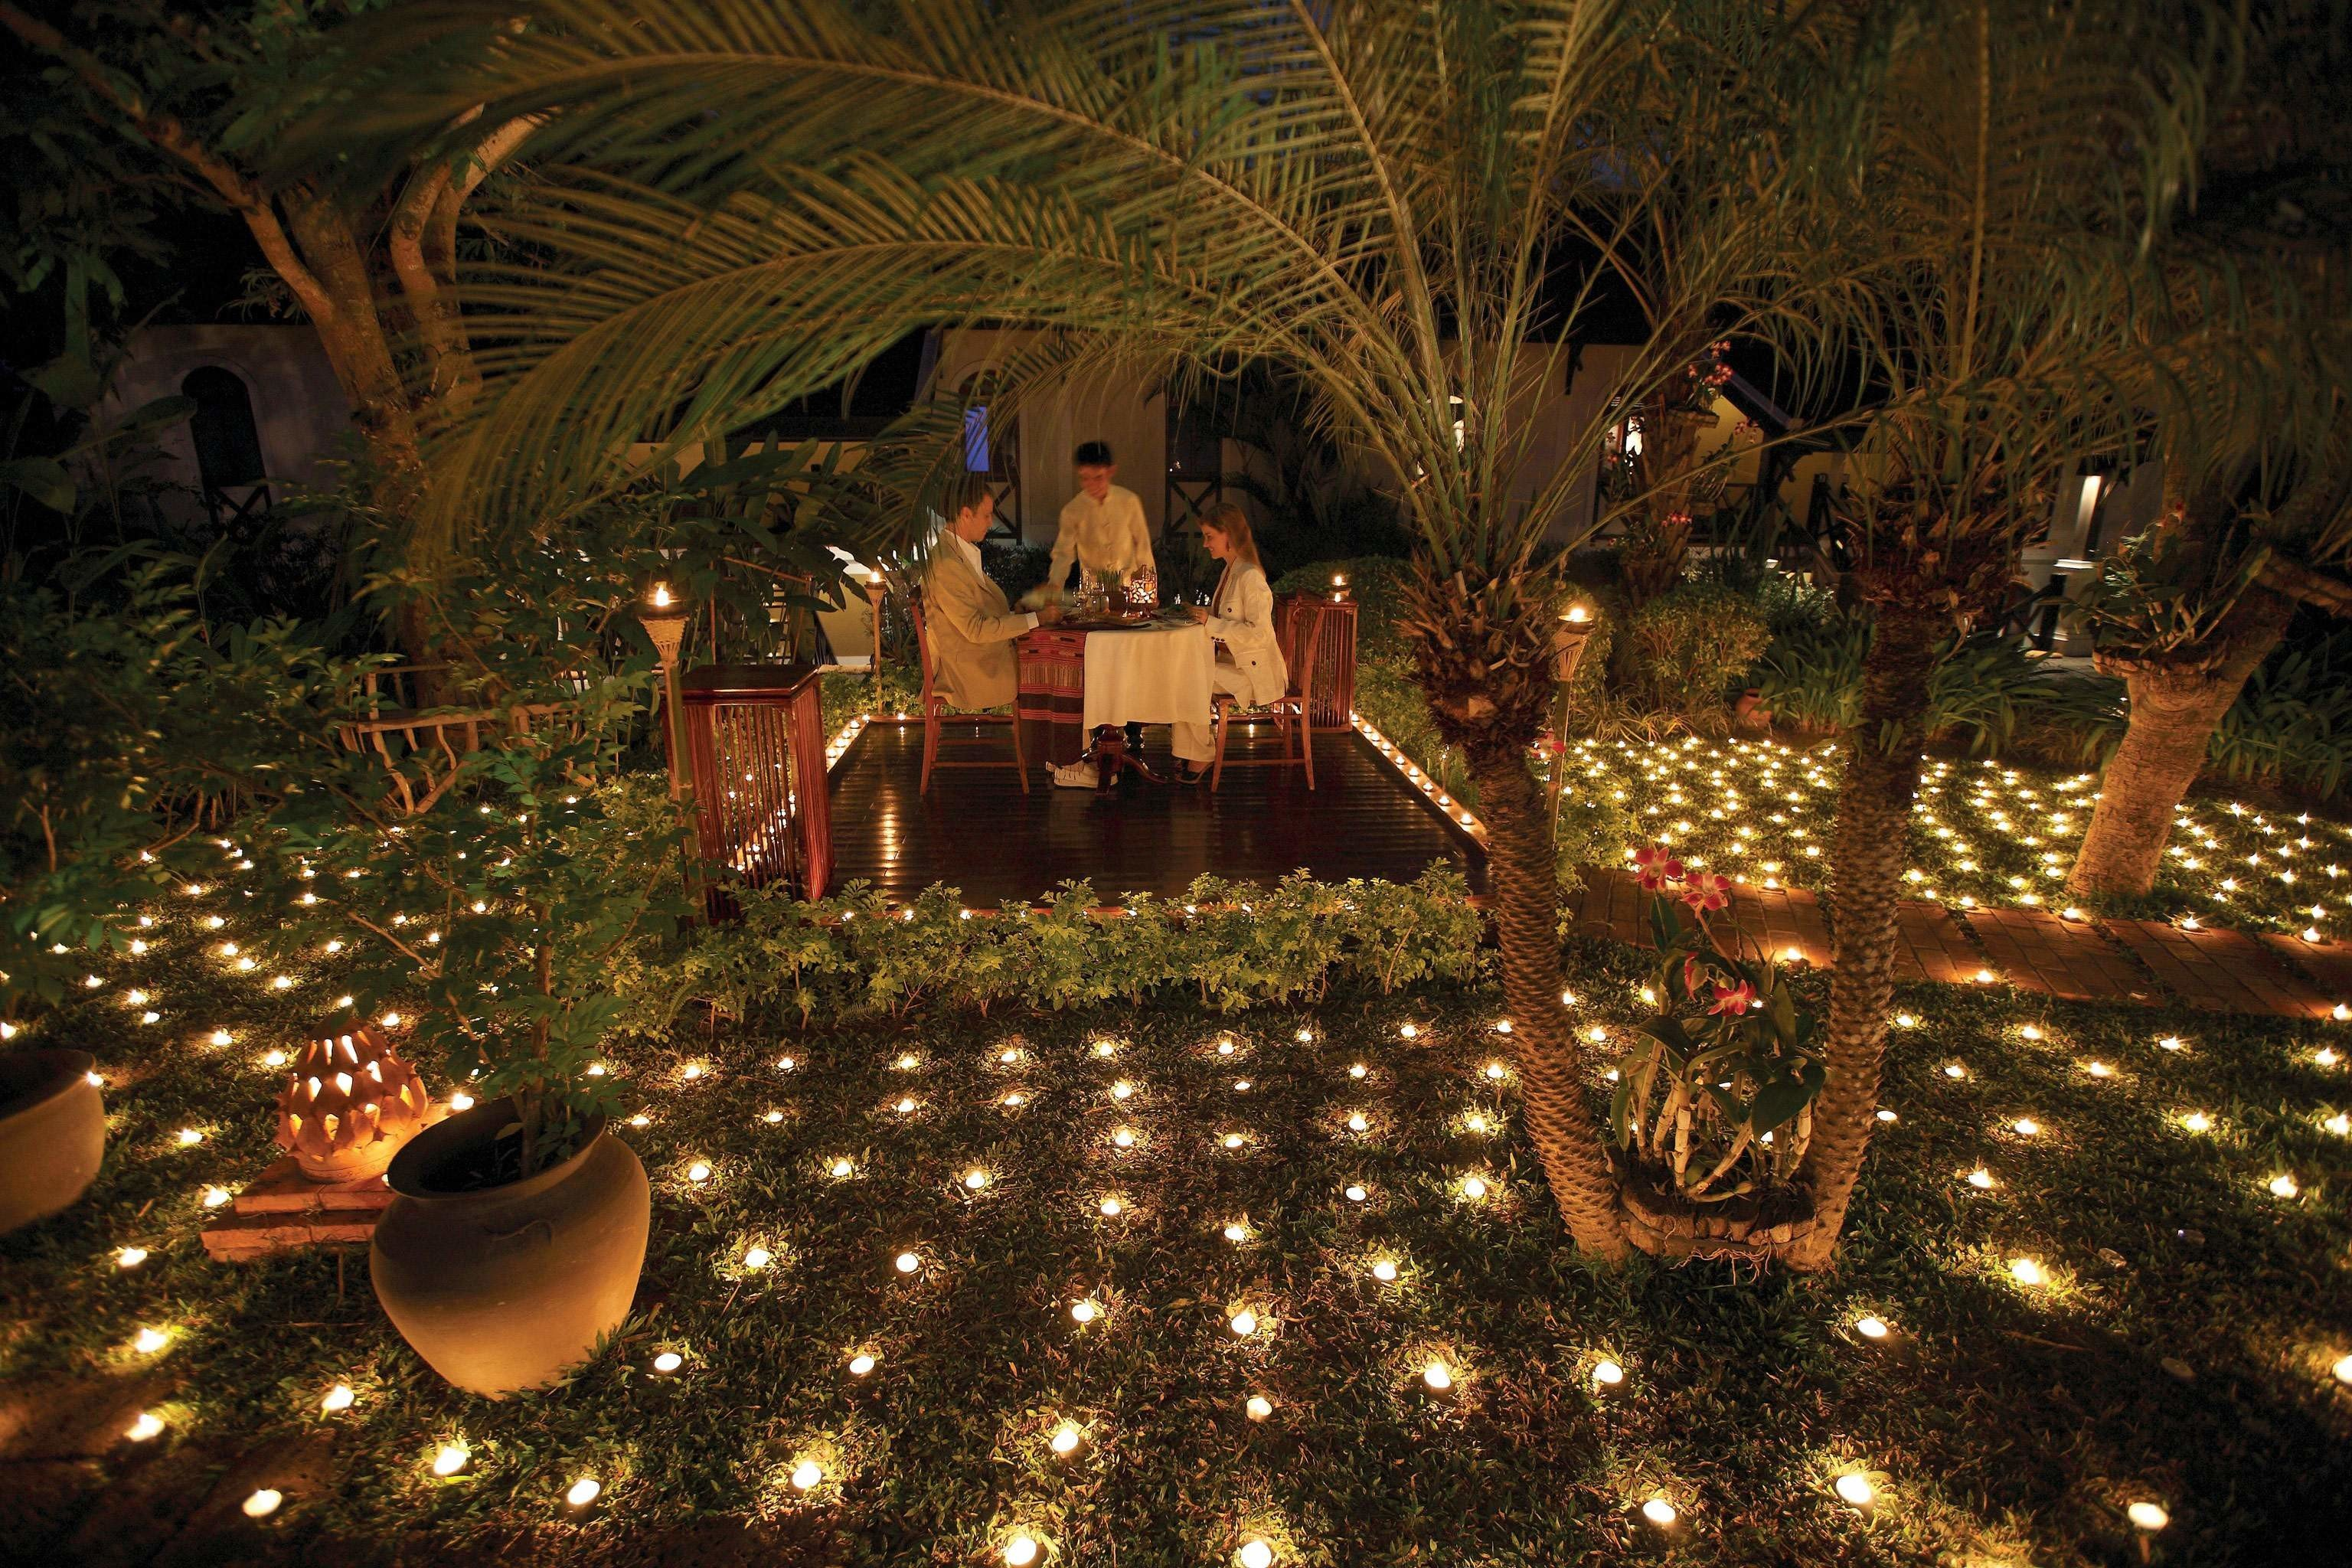 Garden Grounds Nightlife Romantic Christmas christmas decoration christmas lights lit screenshot light landscape lighting night